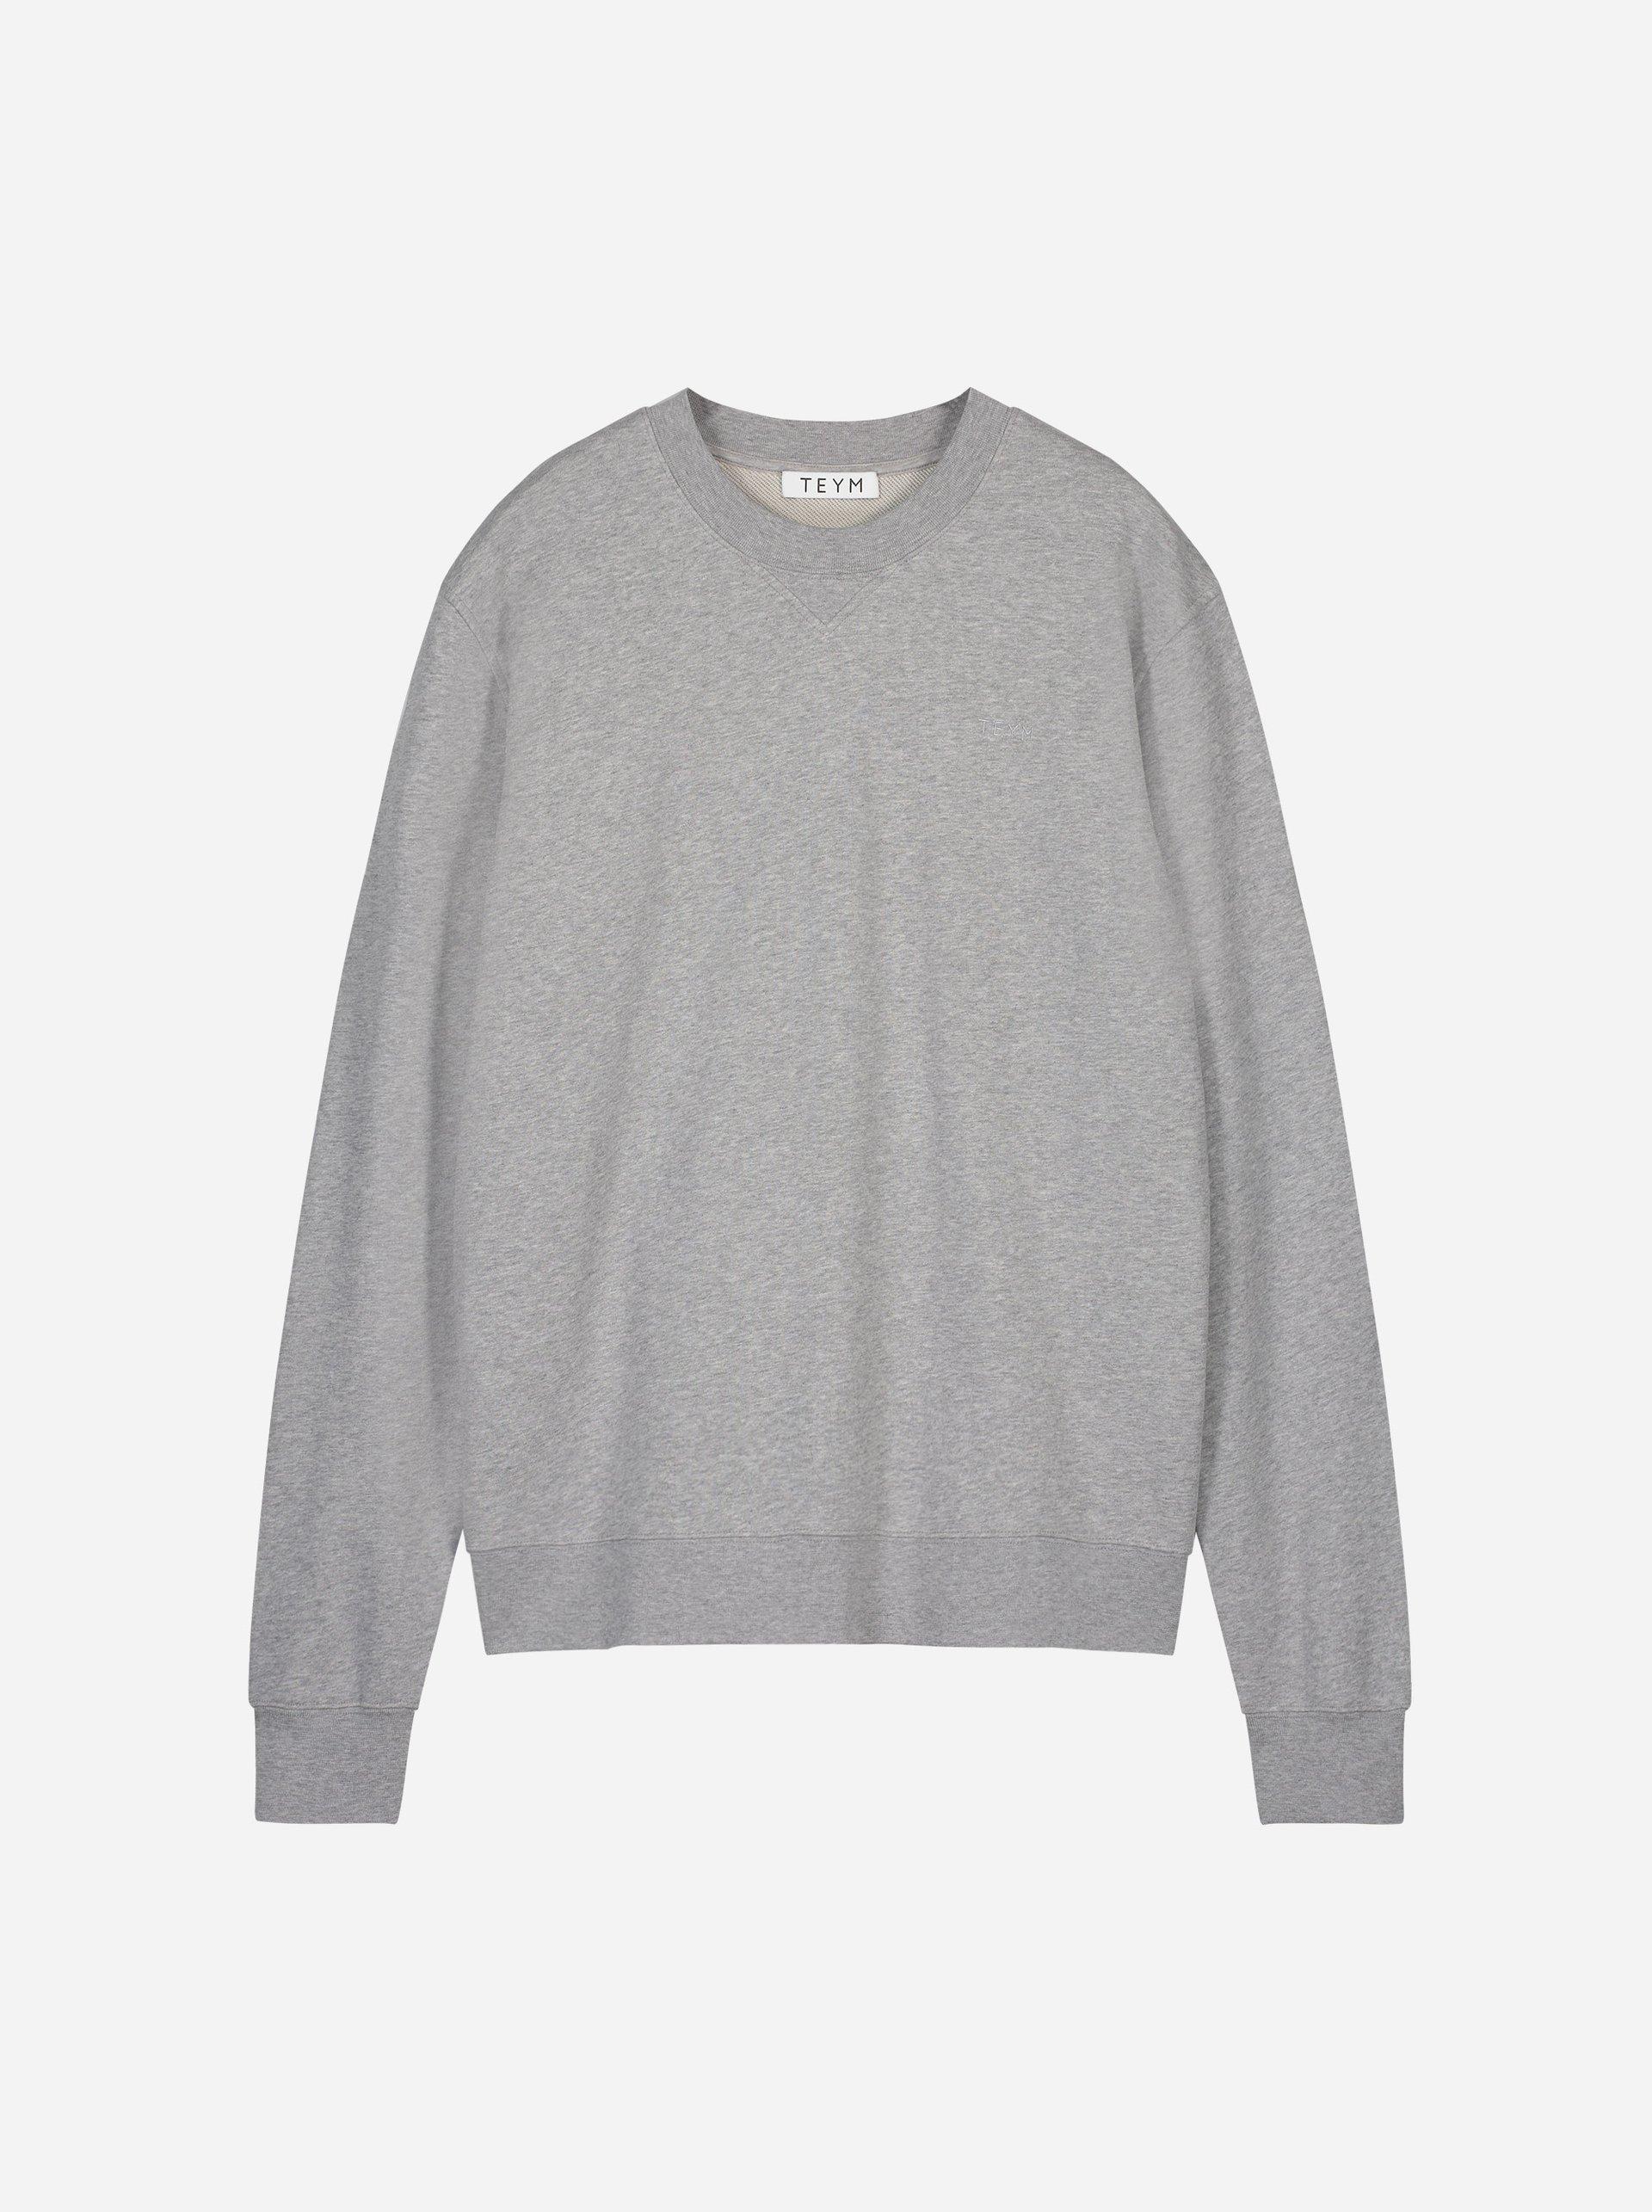 Teym-TheSweatshirt-Men-Grey06